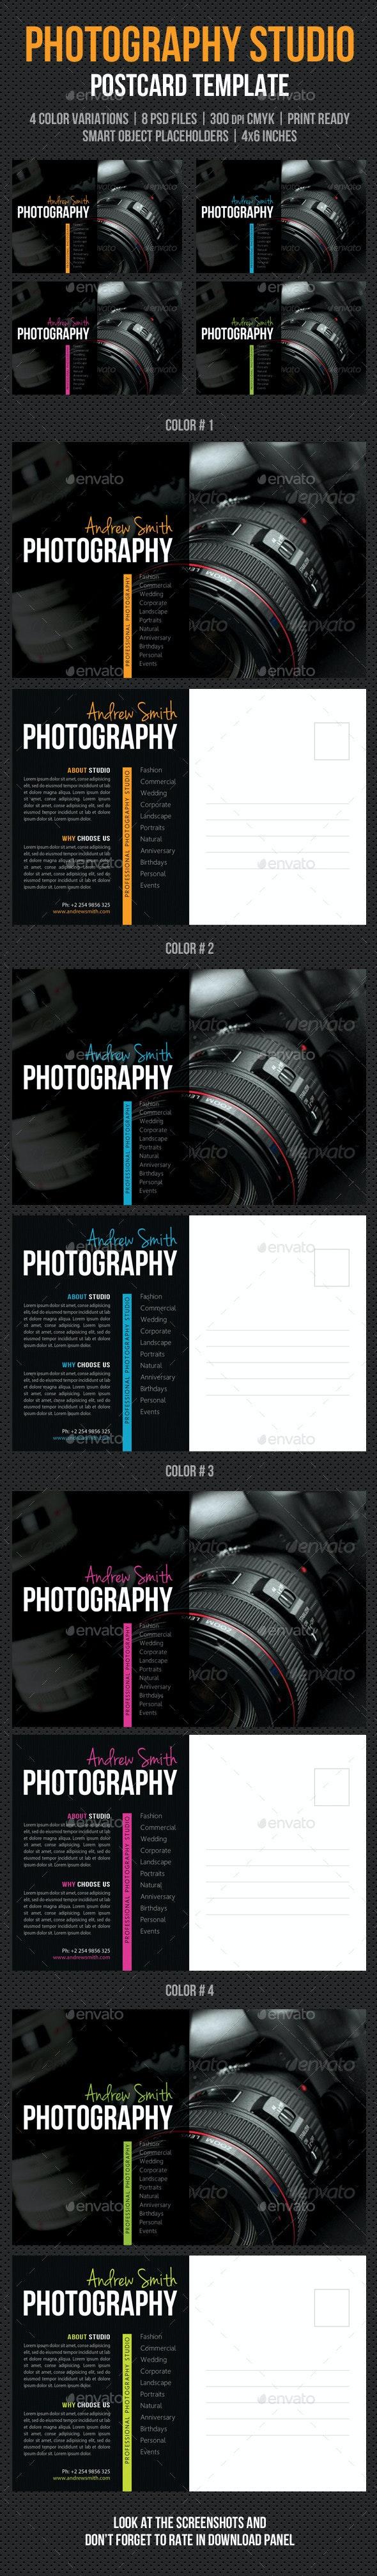 Photography Studio Postcard Template V03 - Cards & Invites Print Templates